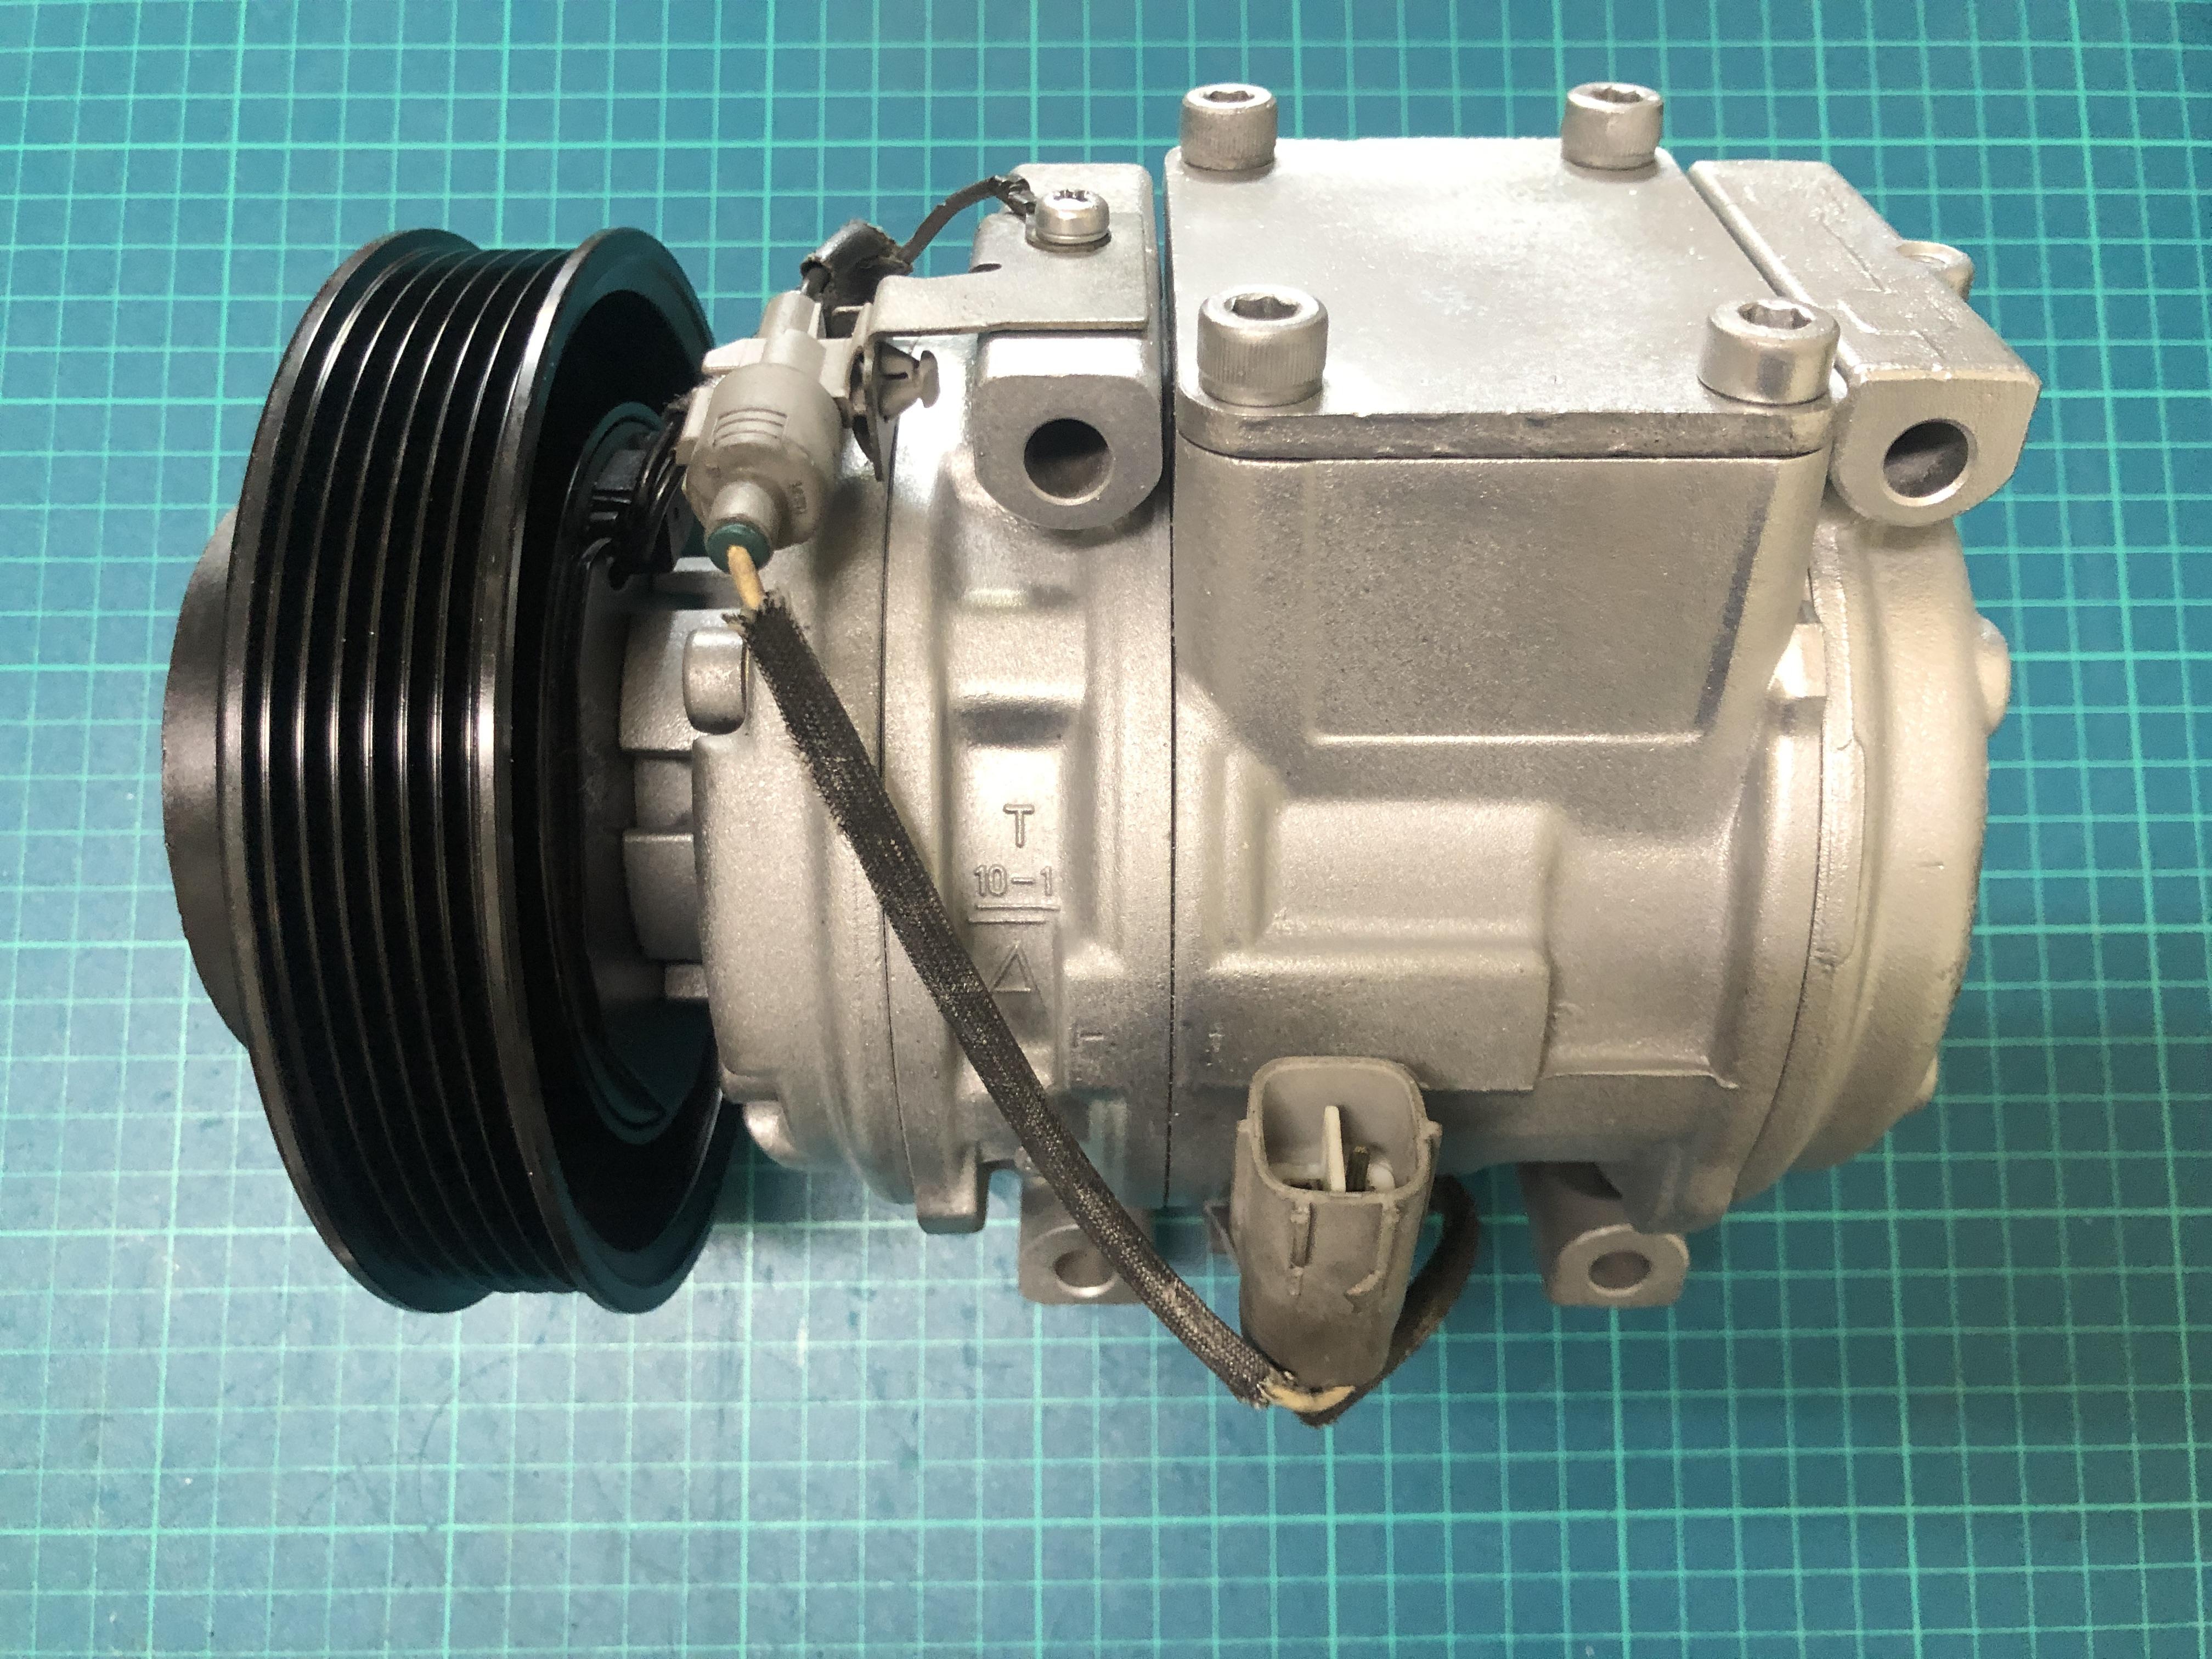 Toyota豐田 Altis 1.8 01-04汽車冷氣壓縮機(外匯整新品)